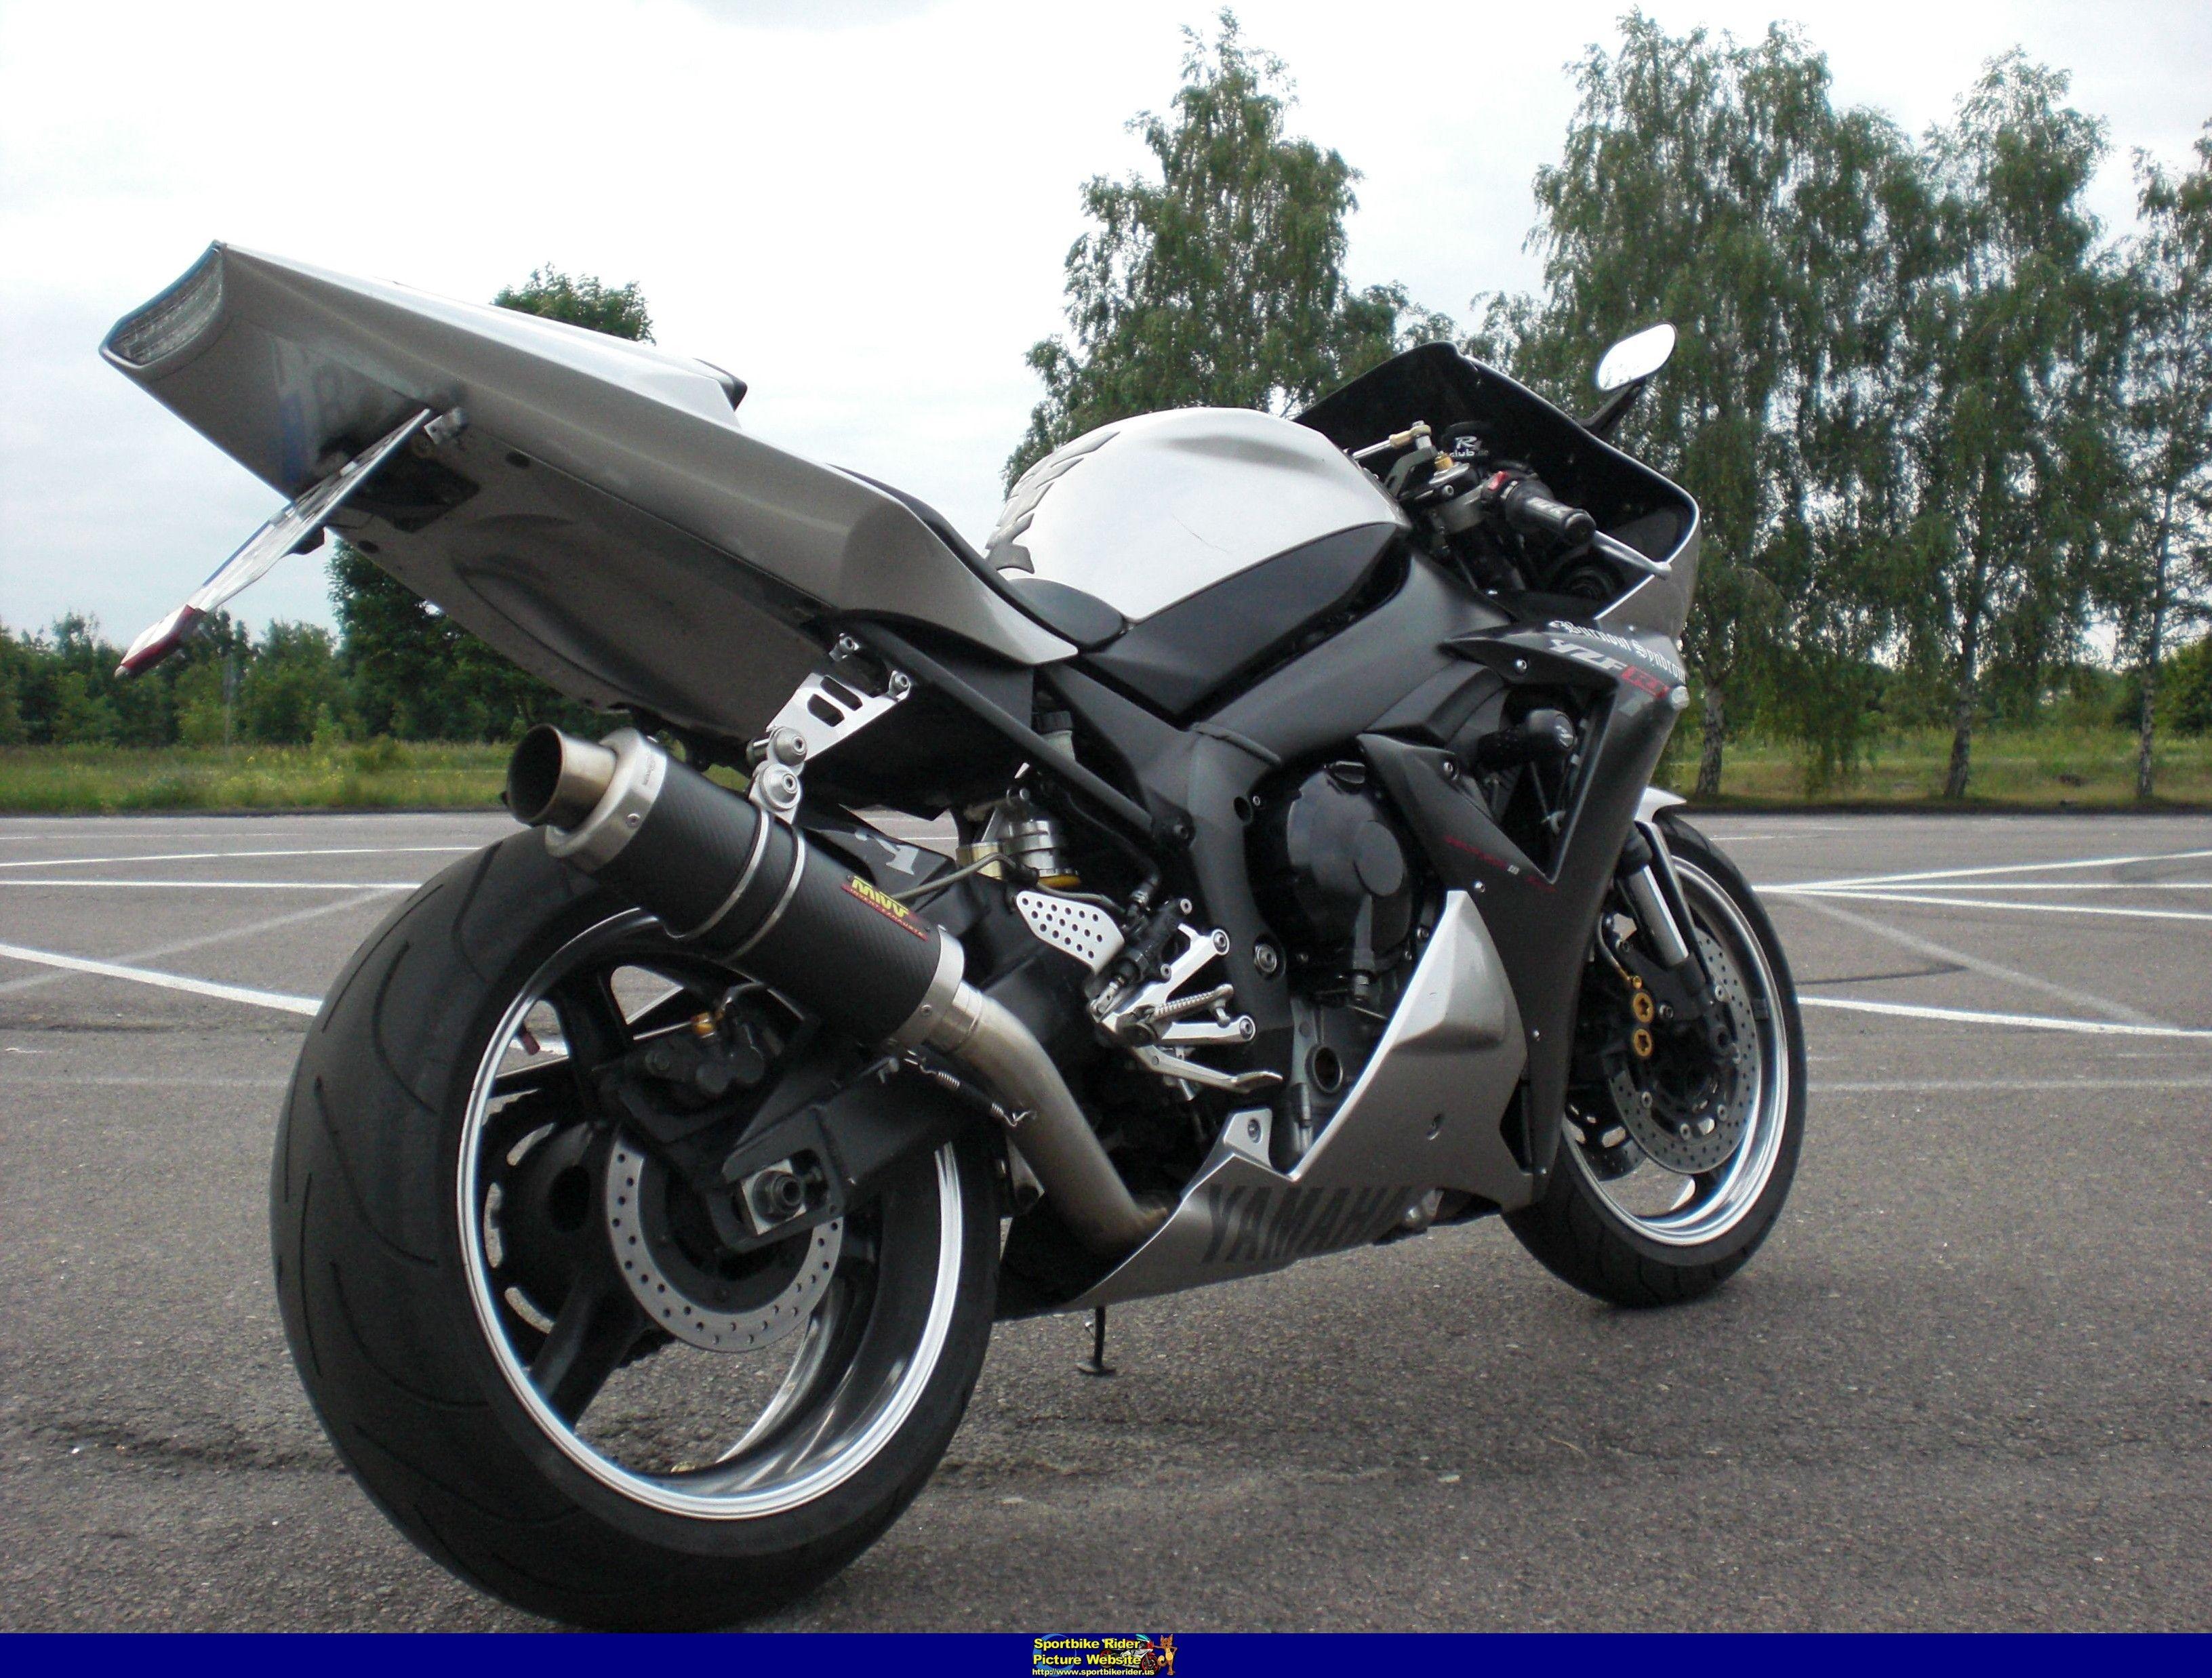 Images Of 2002 Yamaha R1 2002 Yamaha Yzf R1 Moto Zombdrive Com